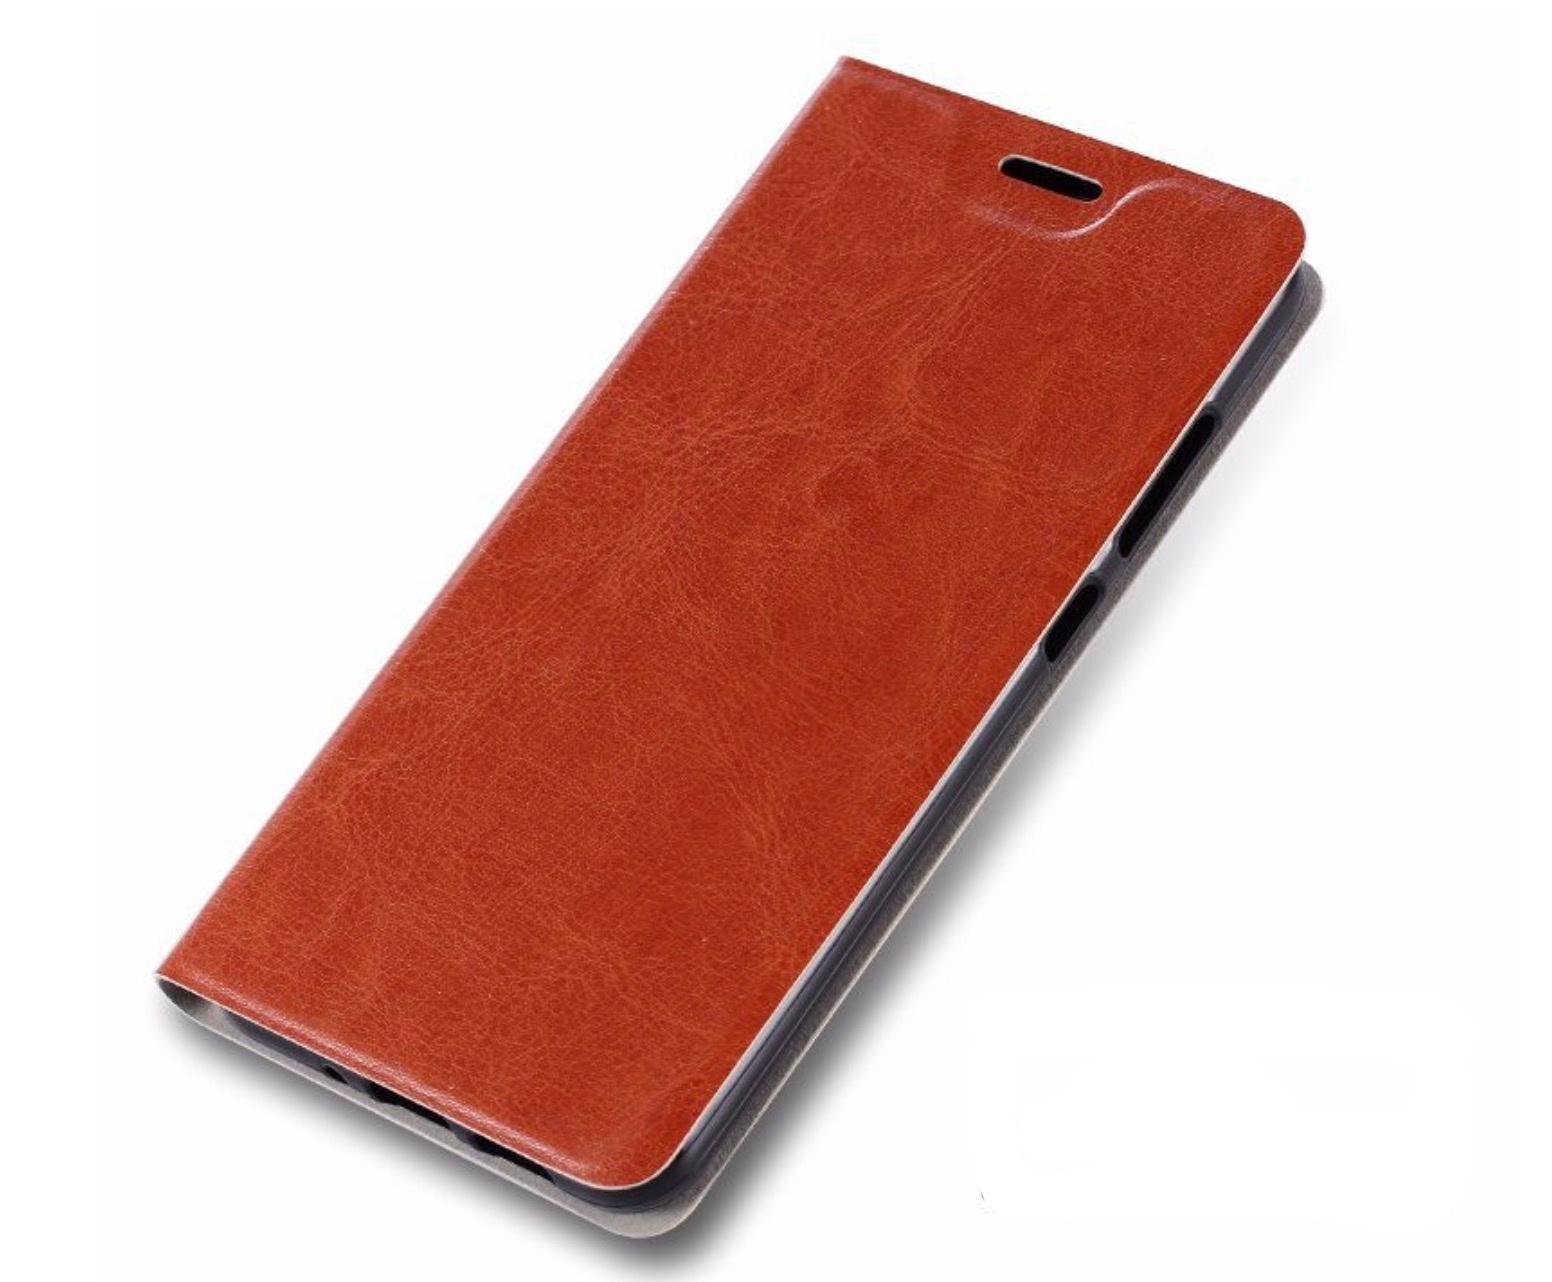 Чехол-книжка MyPads для Samsung Galaxy A5 SM-A520F на жёсткой металлической основе коричневый аксессуар защитное стекло для samsung galaxy a5 2017 sm a520f krutoff group 3d full clear 20240